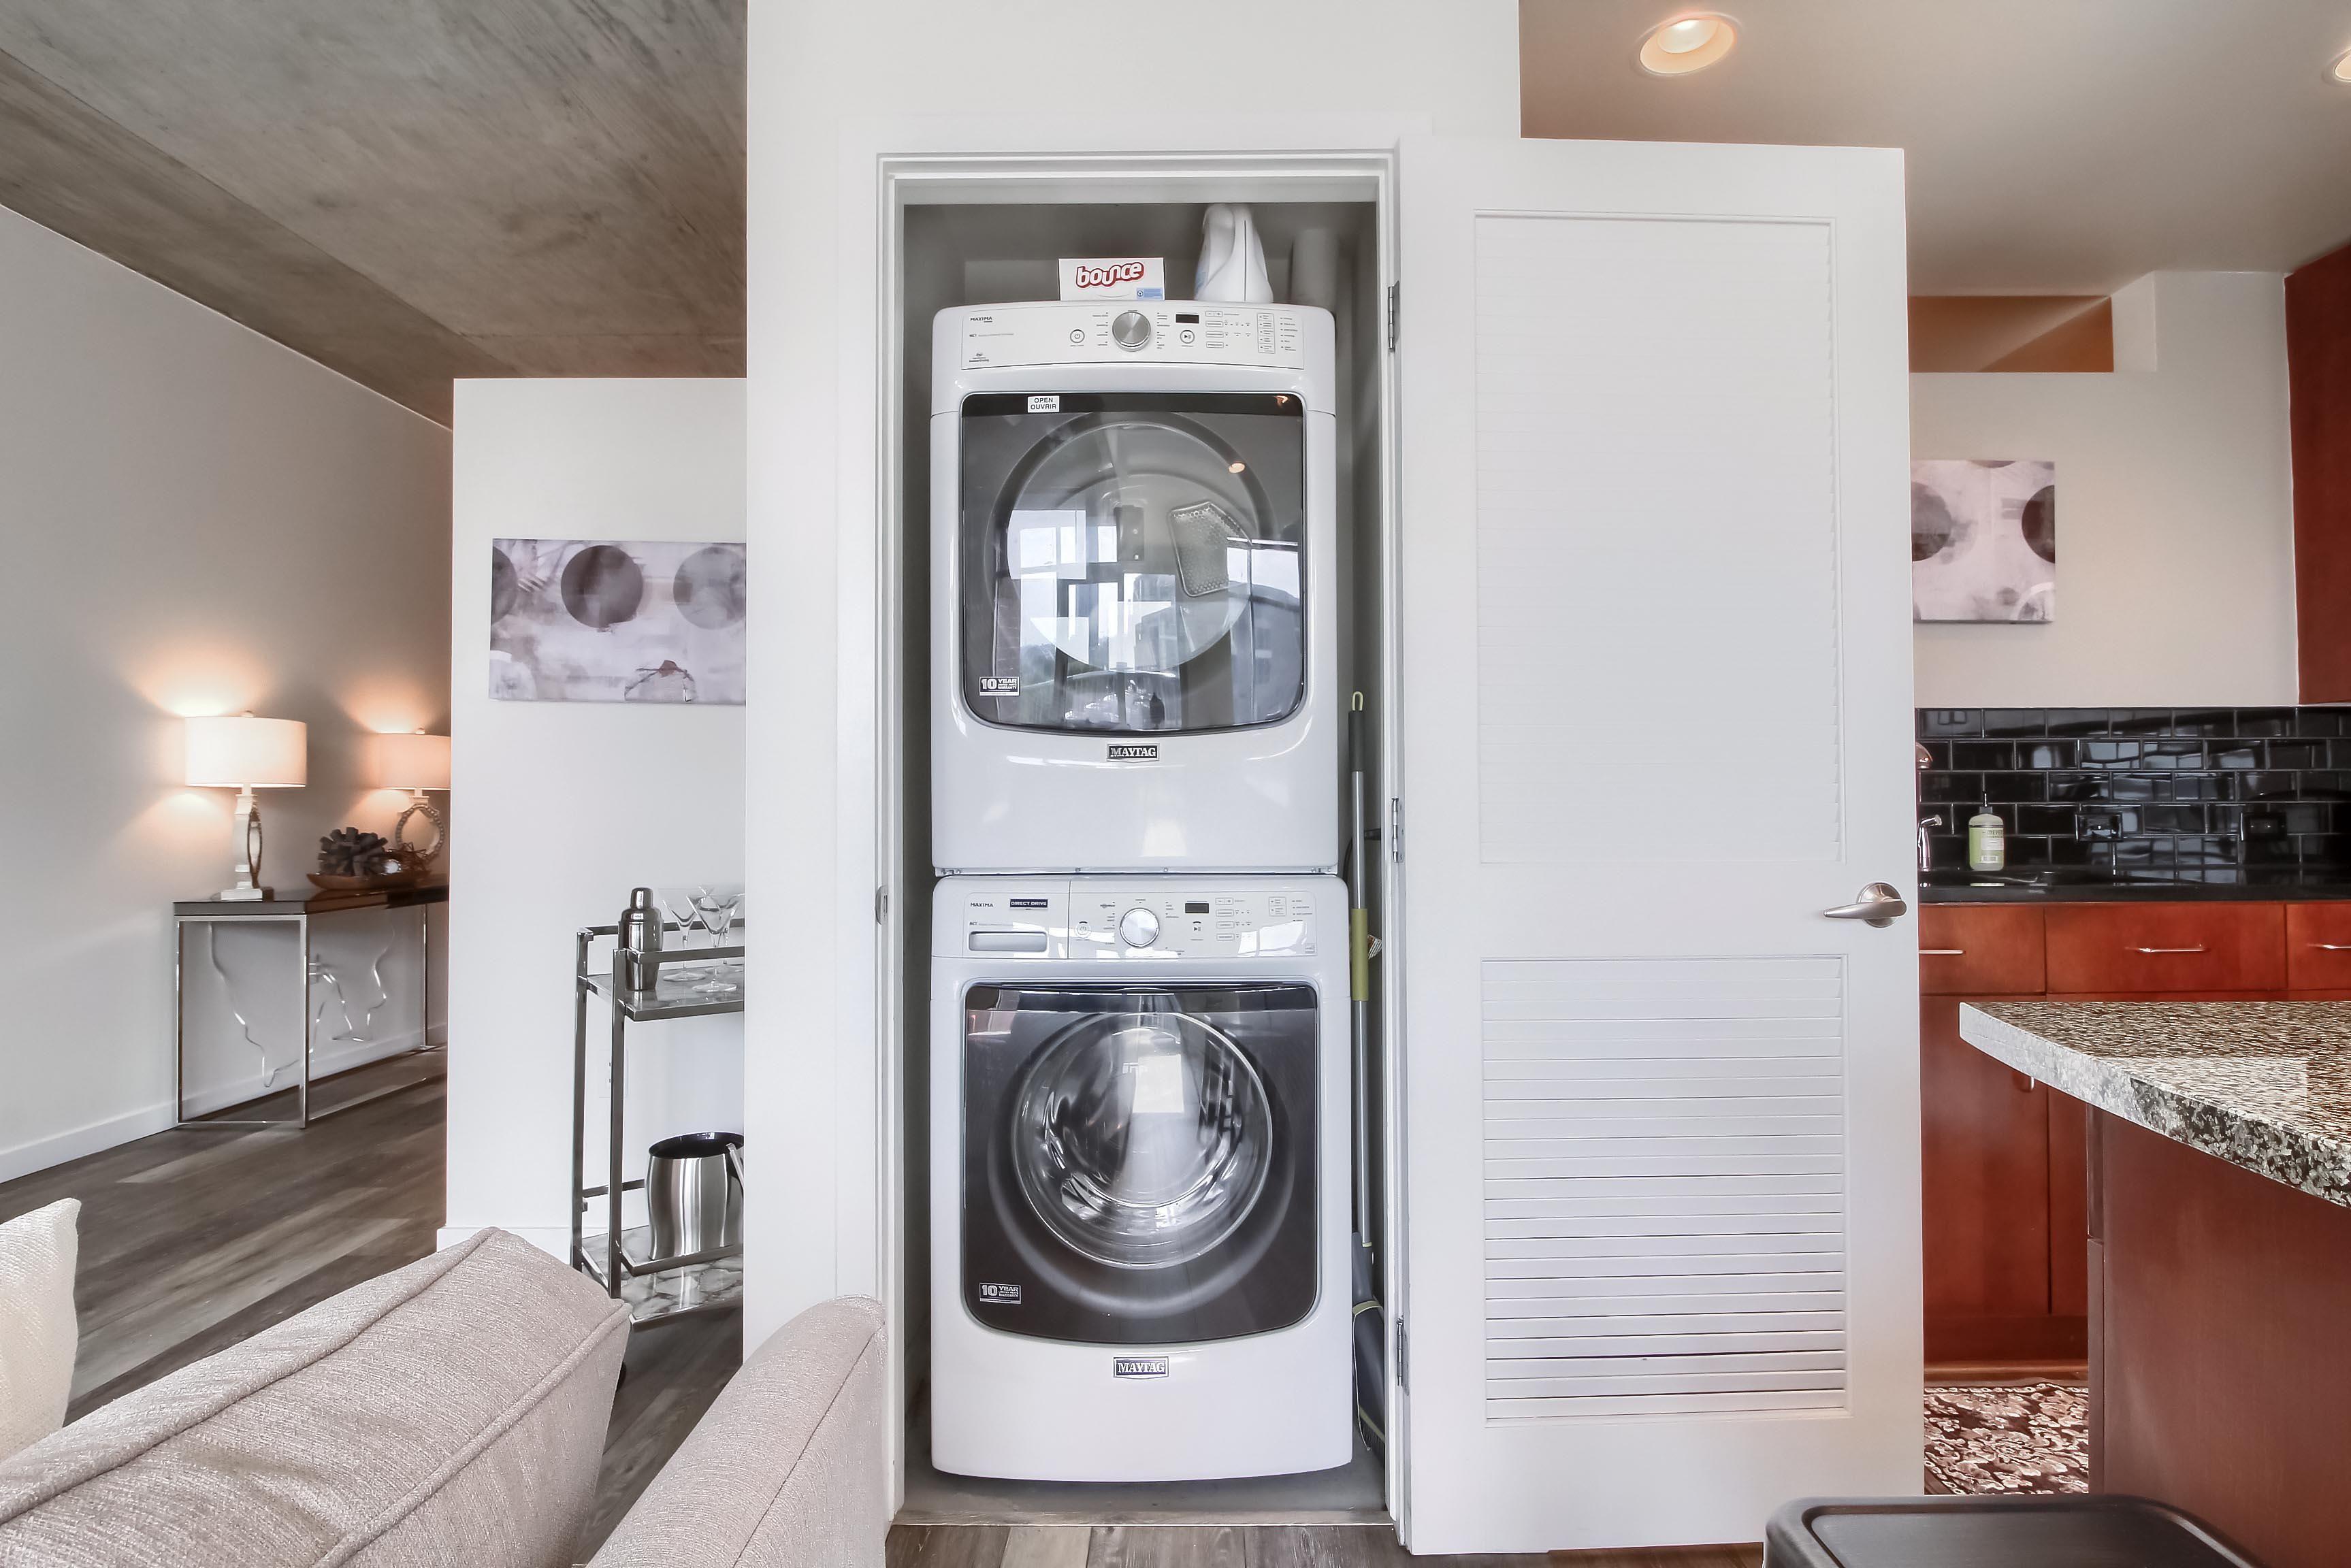 13_Laundry_Room__MG_0942.JPG